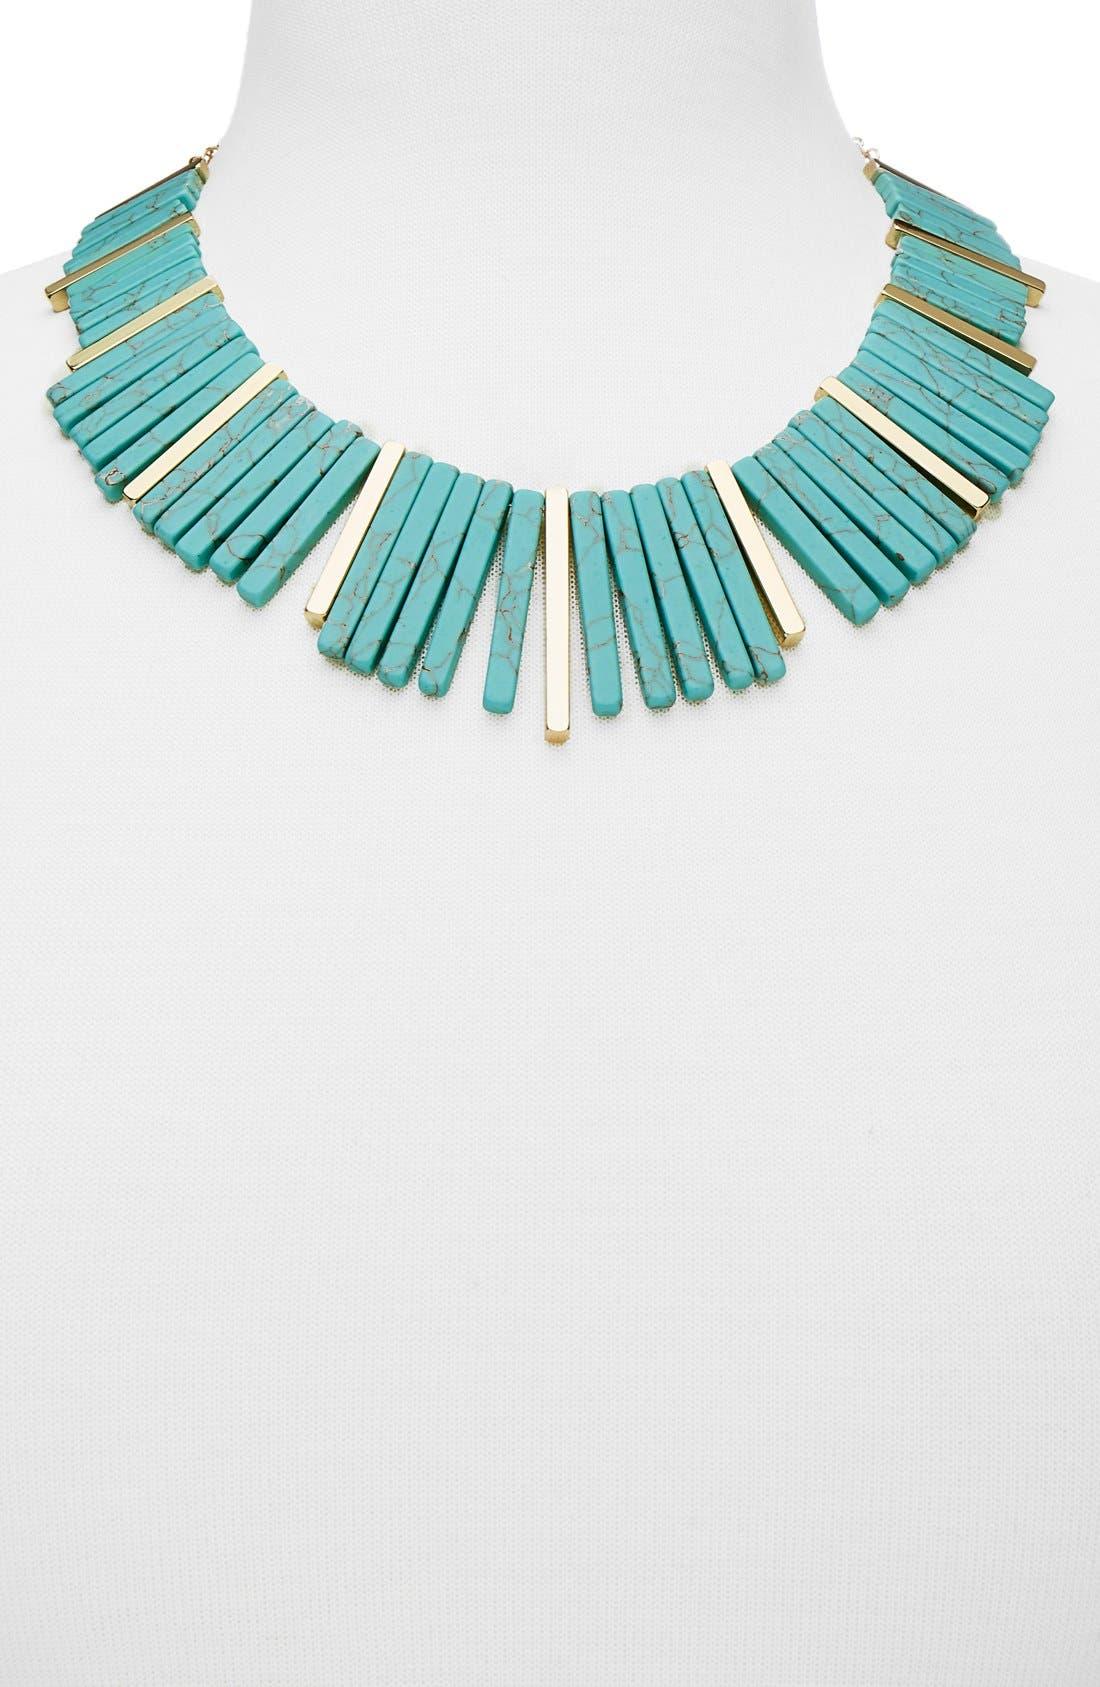 Stone Bib Necklace,                             Alternate thumbnail 2, color,                             Gold/ Turquoise